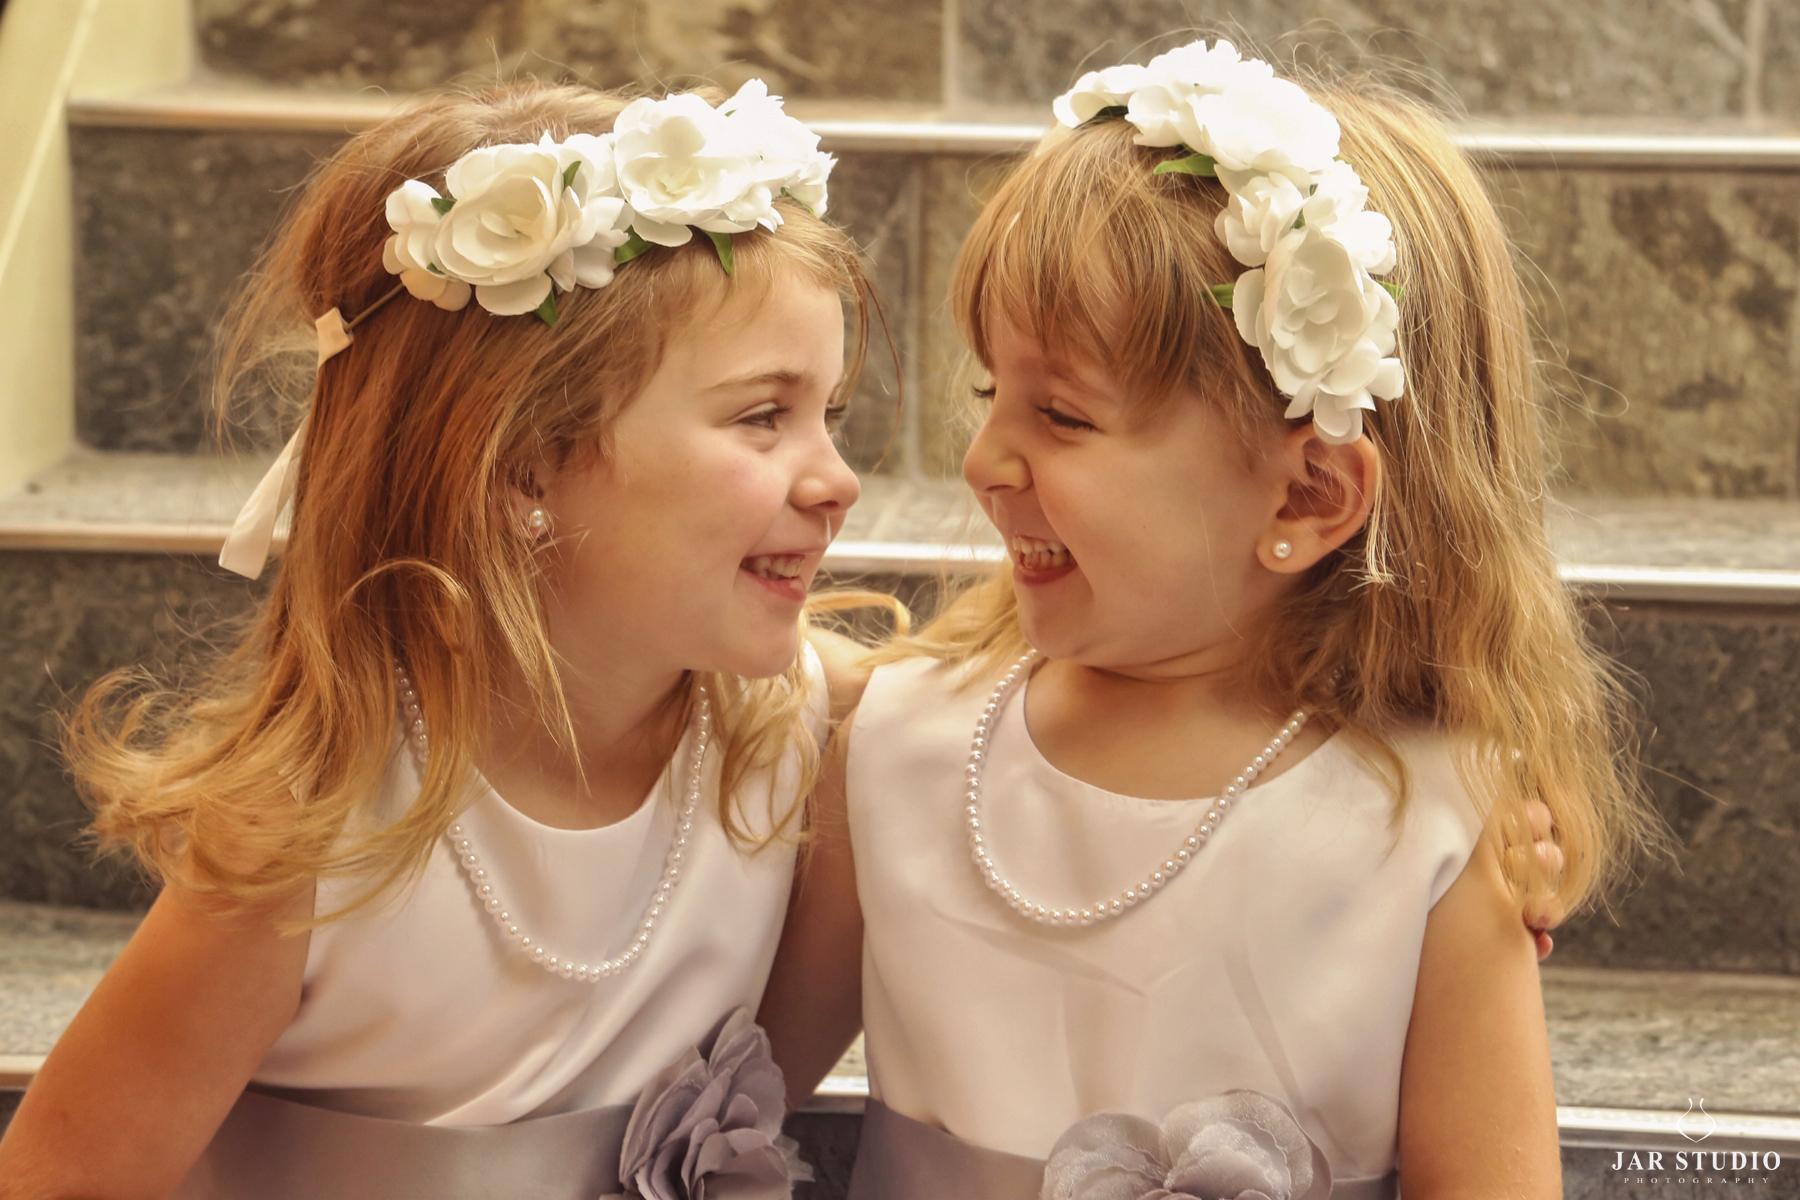 06-flower-girls-fun-cute-photography-jarstudio.jpg